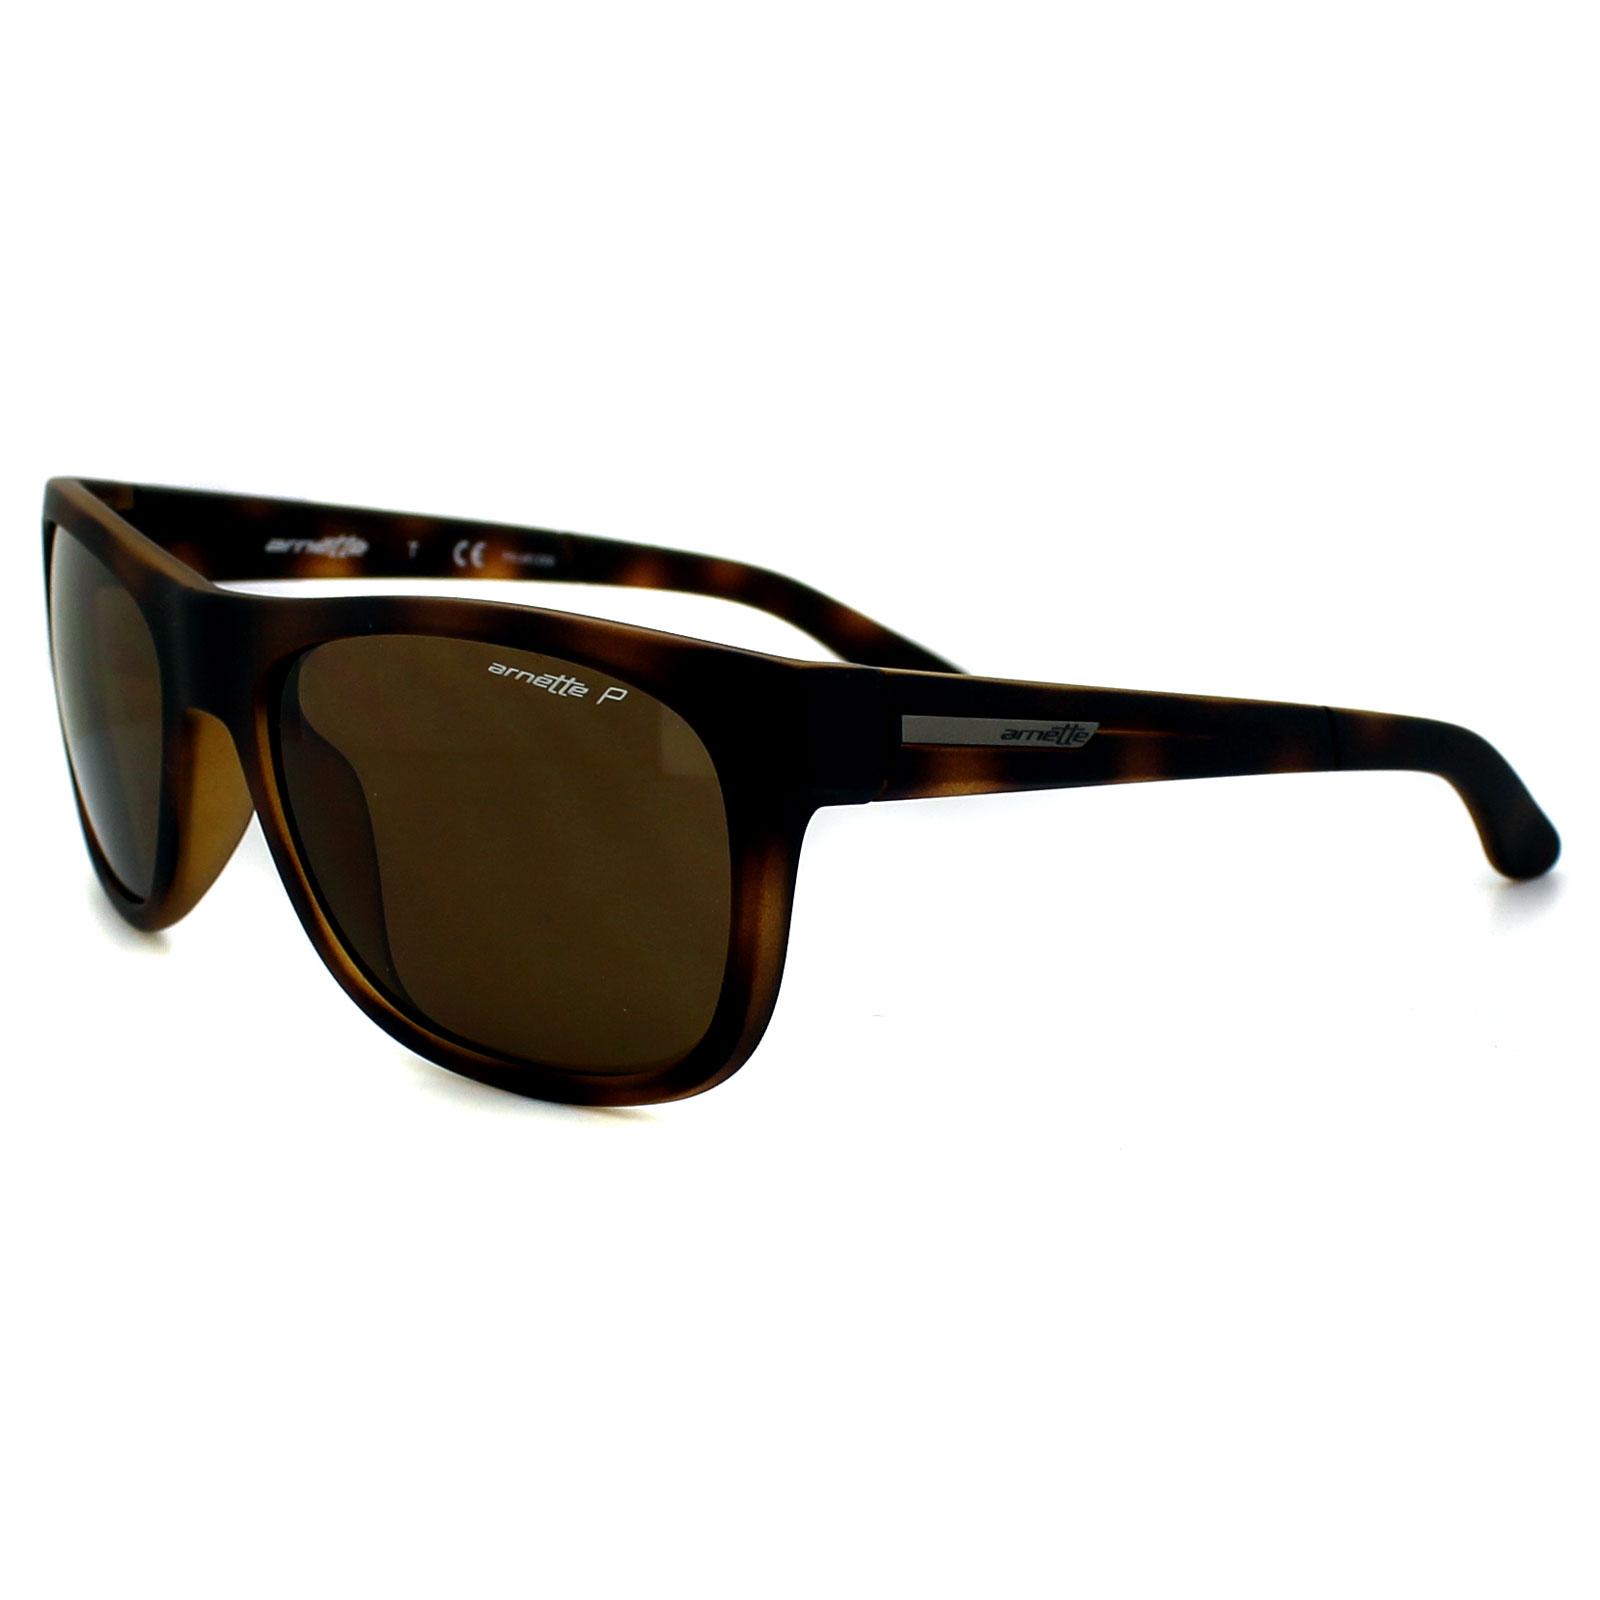 66c446f1d7 Details about Arnette Sunglasses 4206 Fire Drill Lite 215283 Fuzzy Havana  Brown Polarized